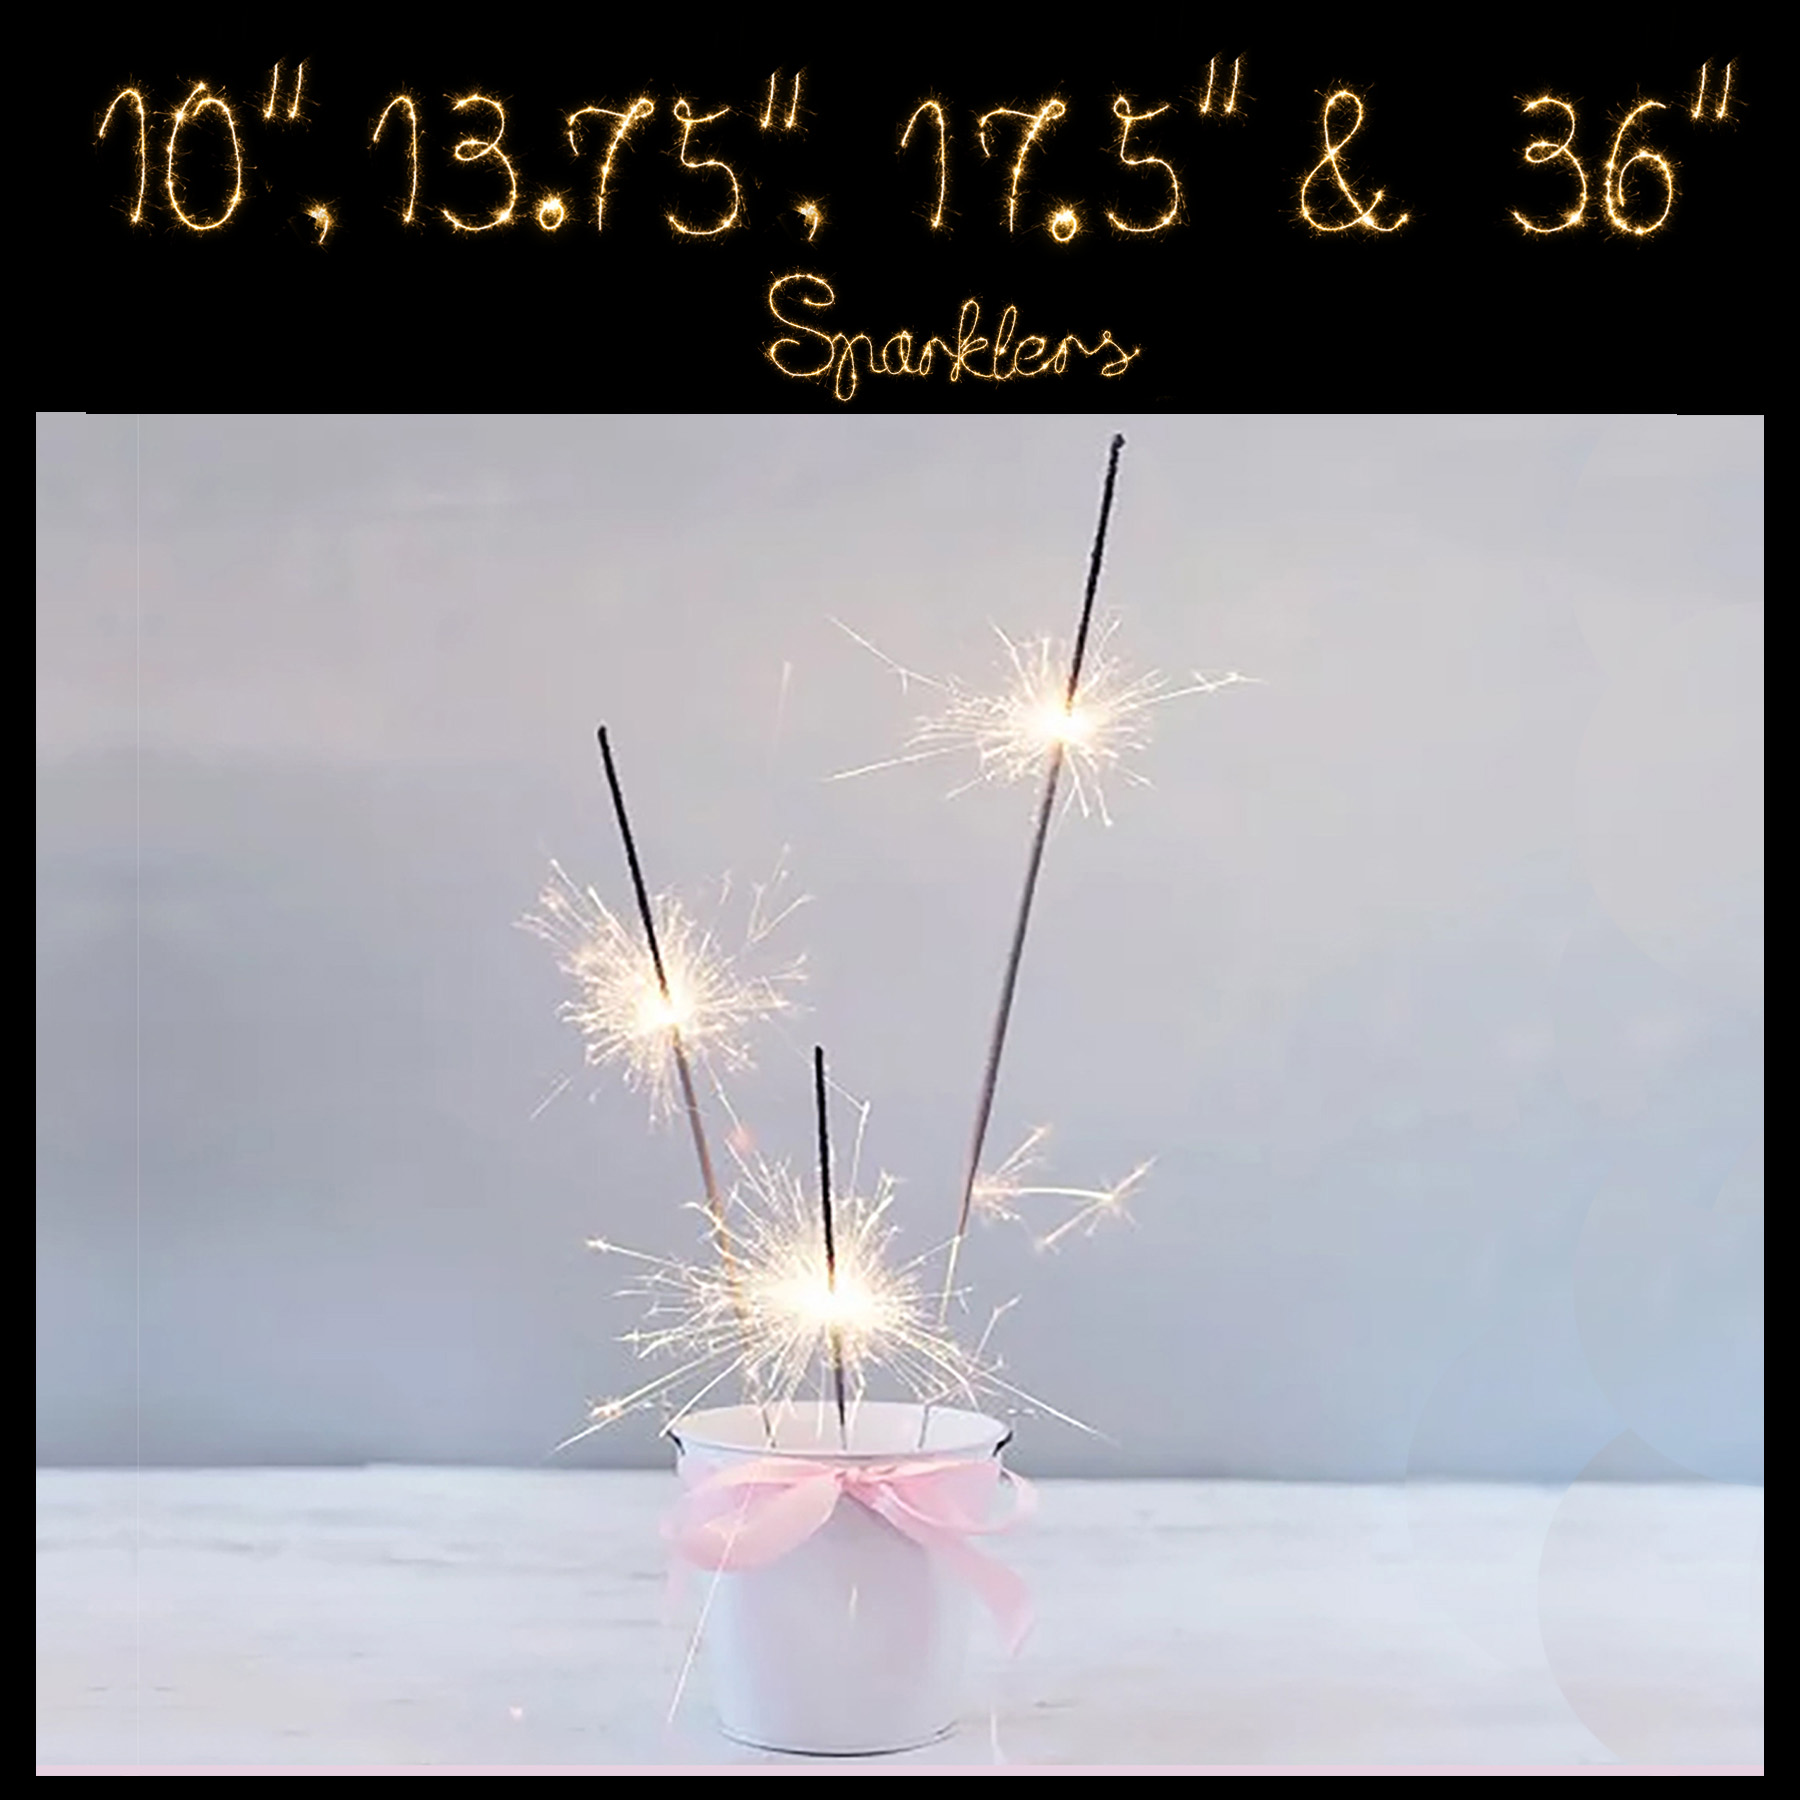 sparkler inches2.jpg